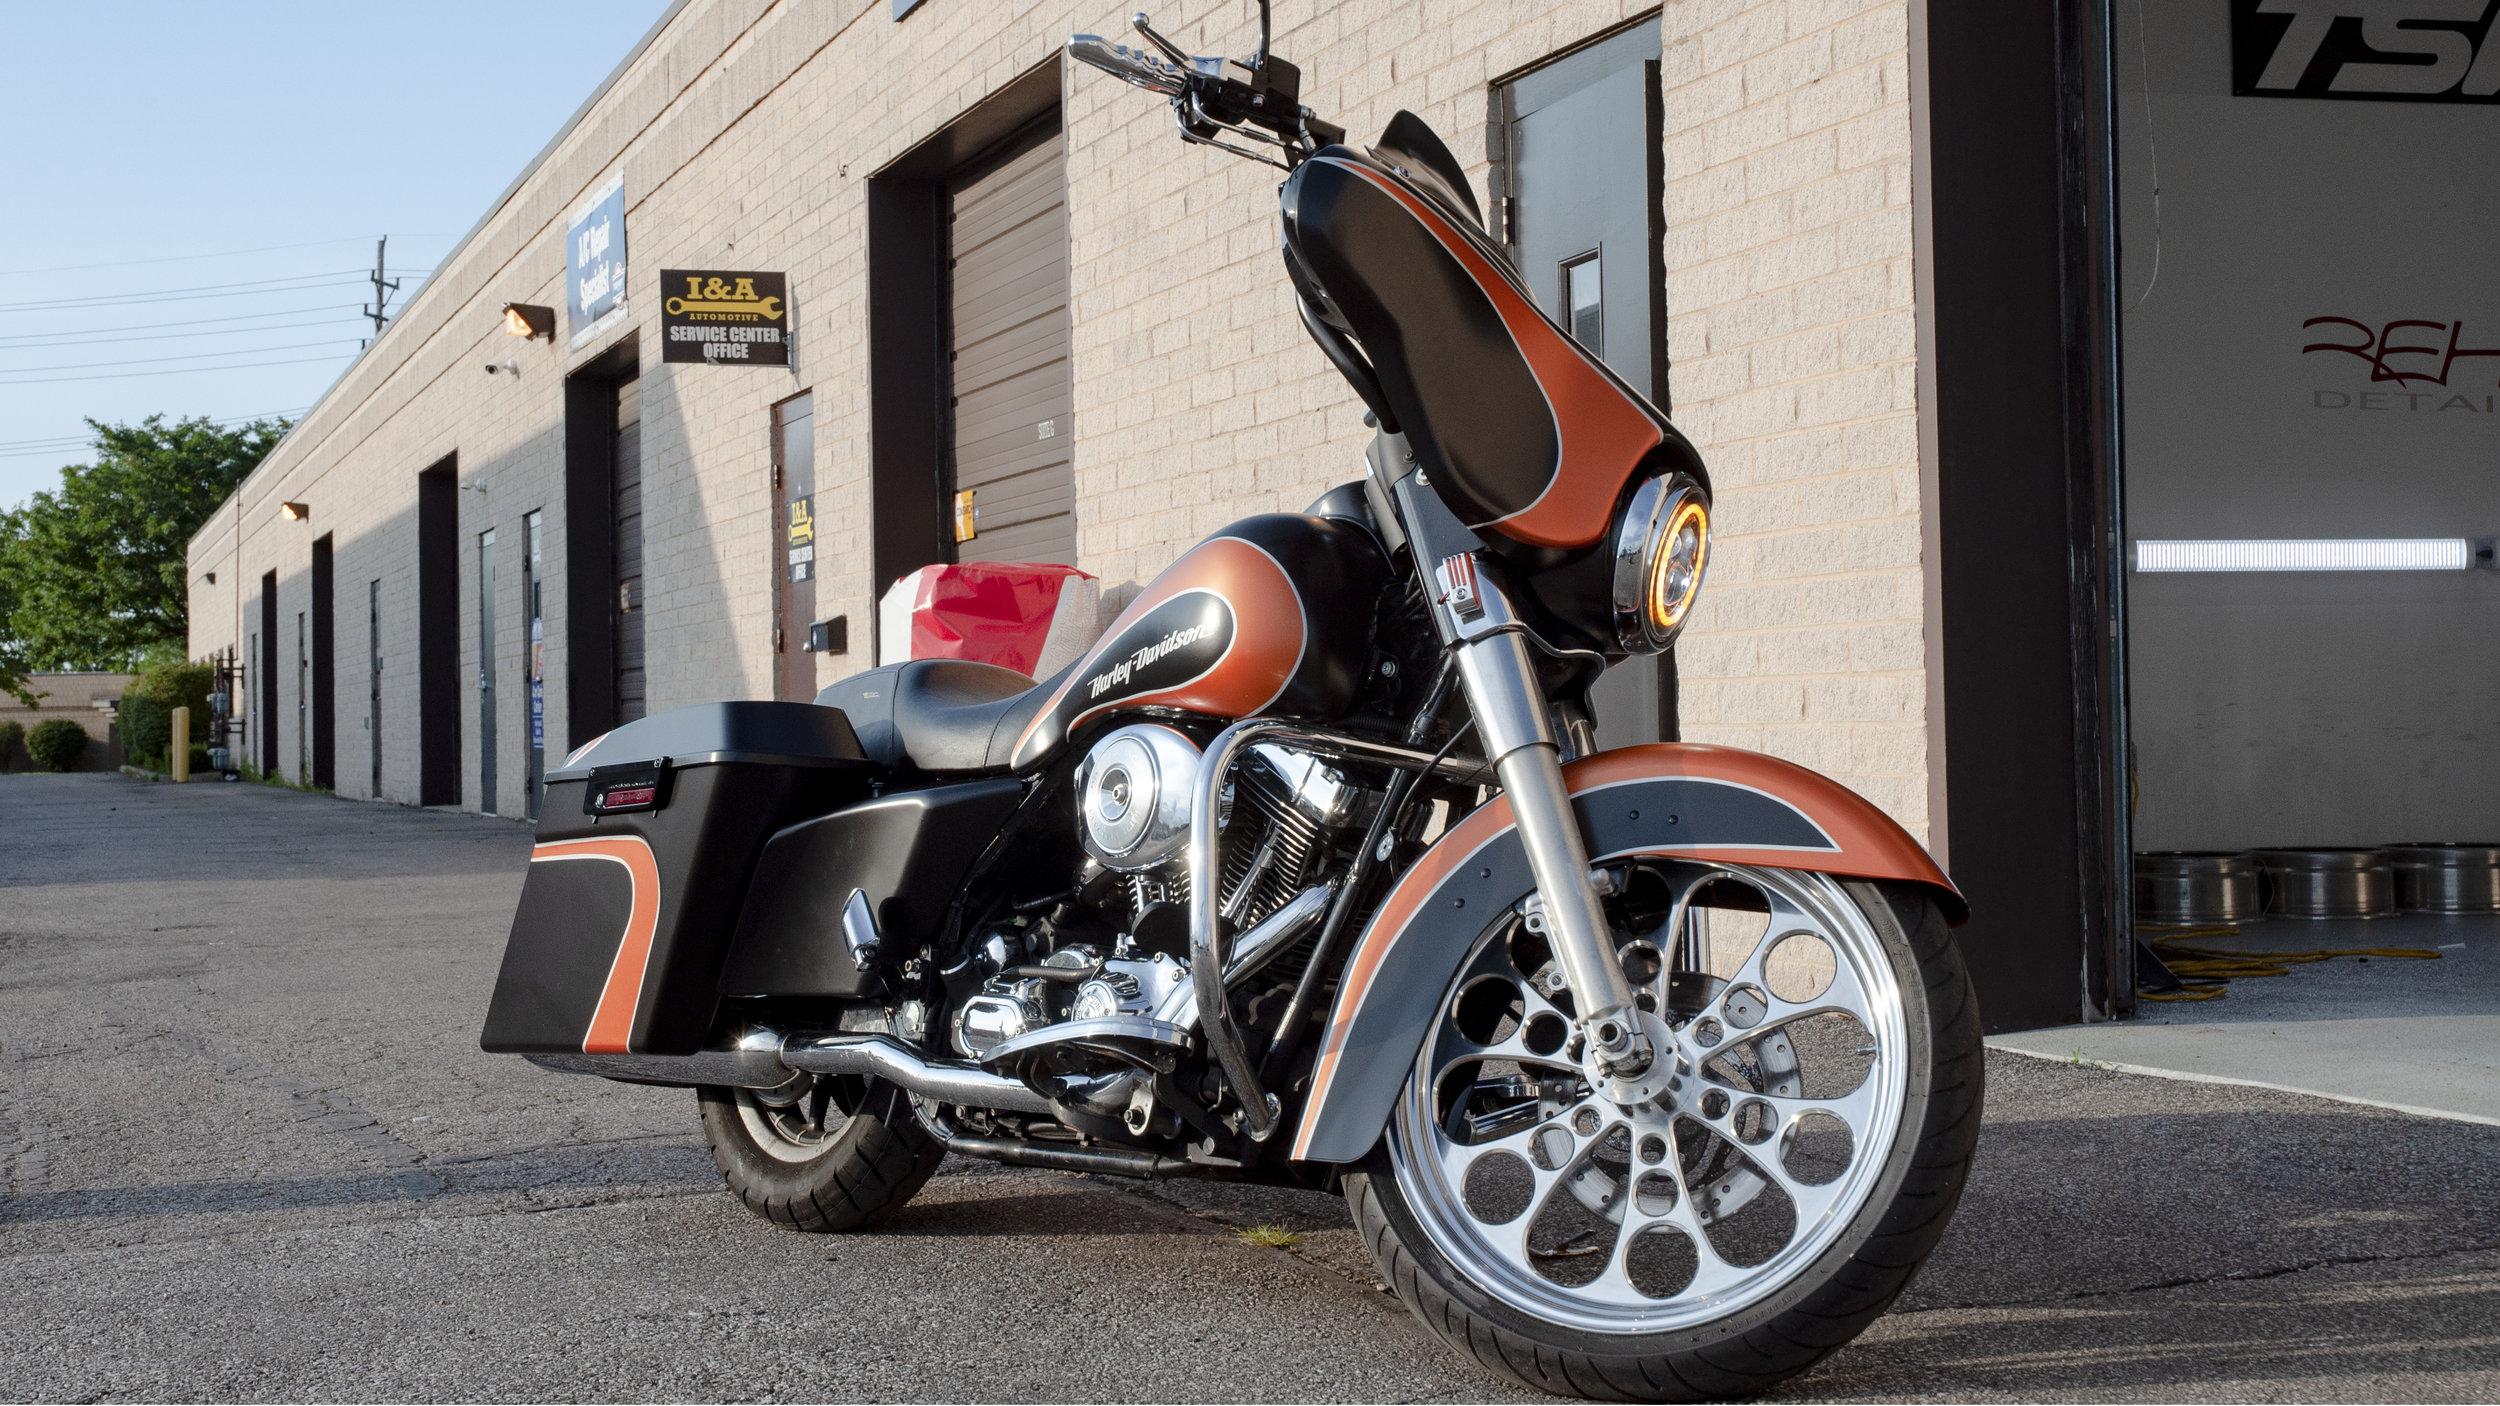 Custom Harley Big Wheel Bagger - Custom Designed Satin Black, Satin Orange and Matte Silver Design